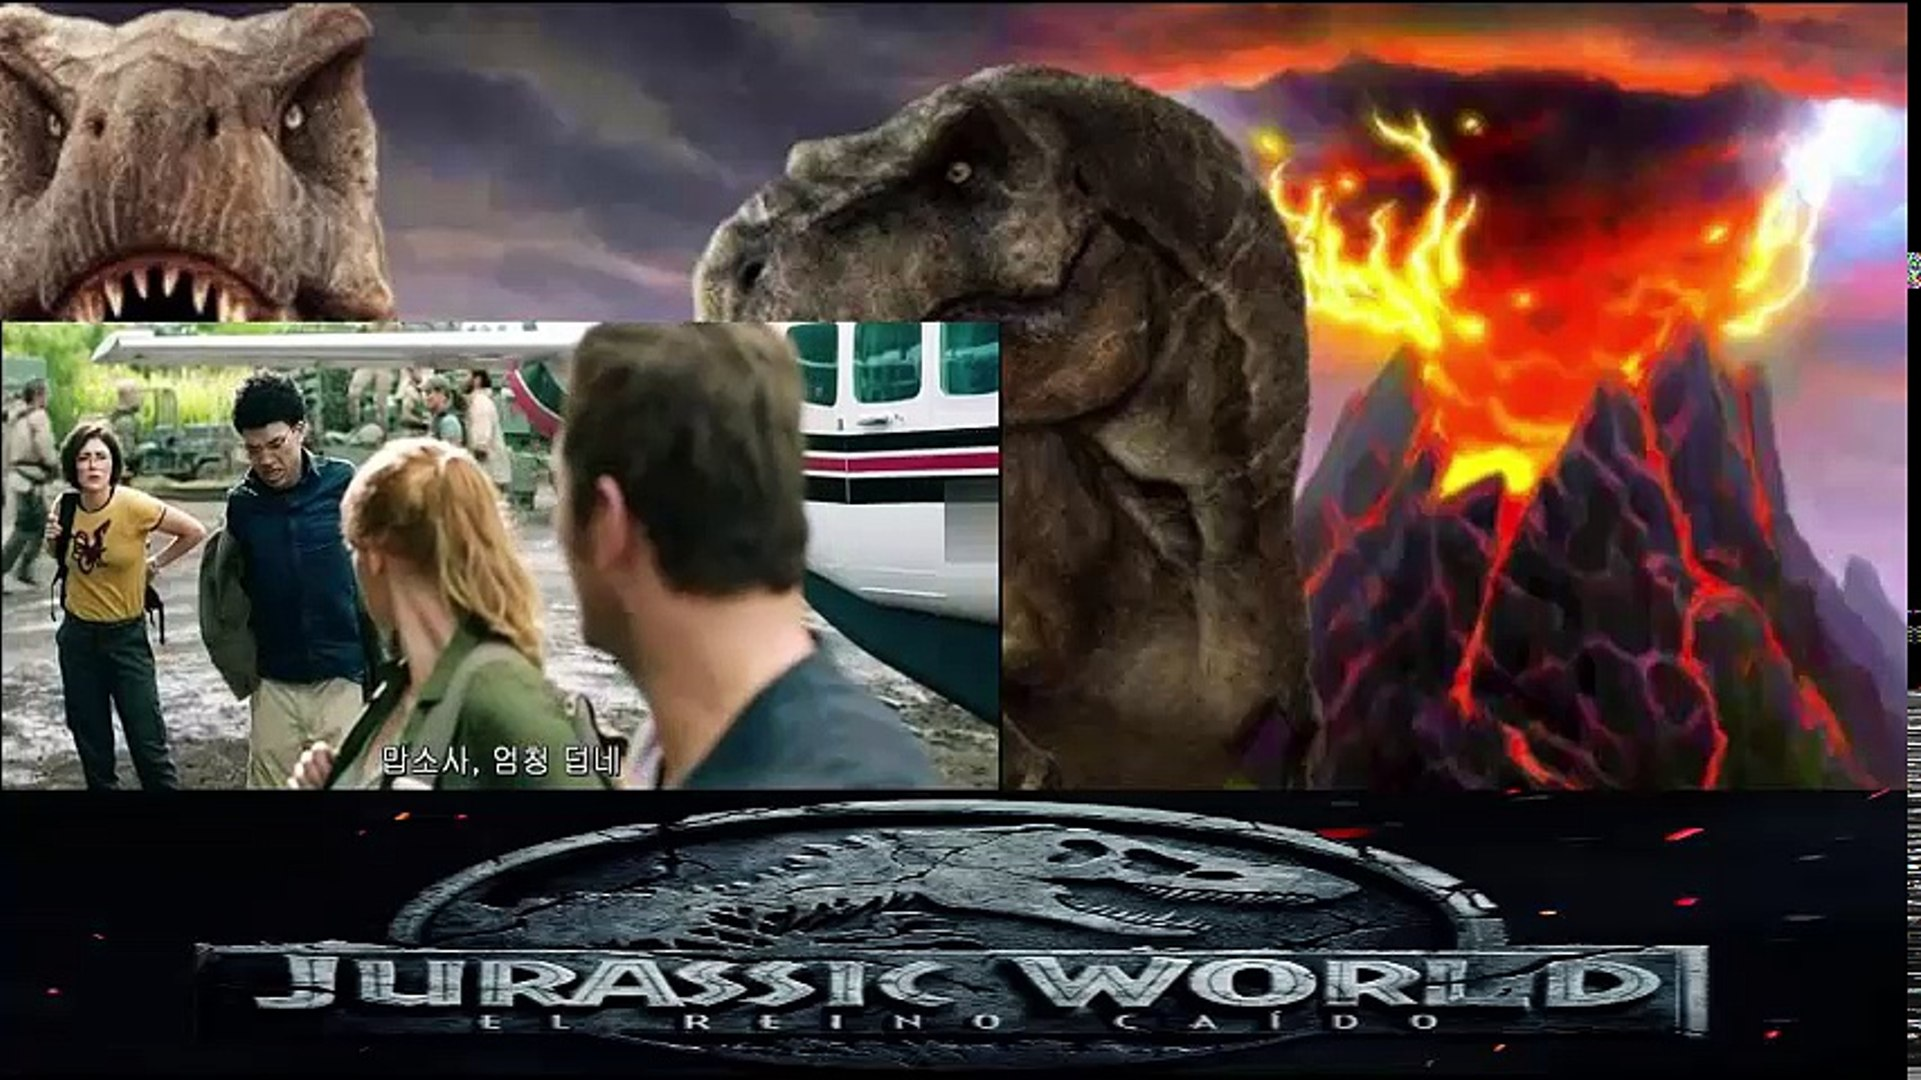 Jurassic World 2 2018 Pelicula Completa Online Español Castellano Vídeo Dailymotion